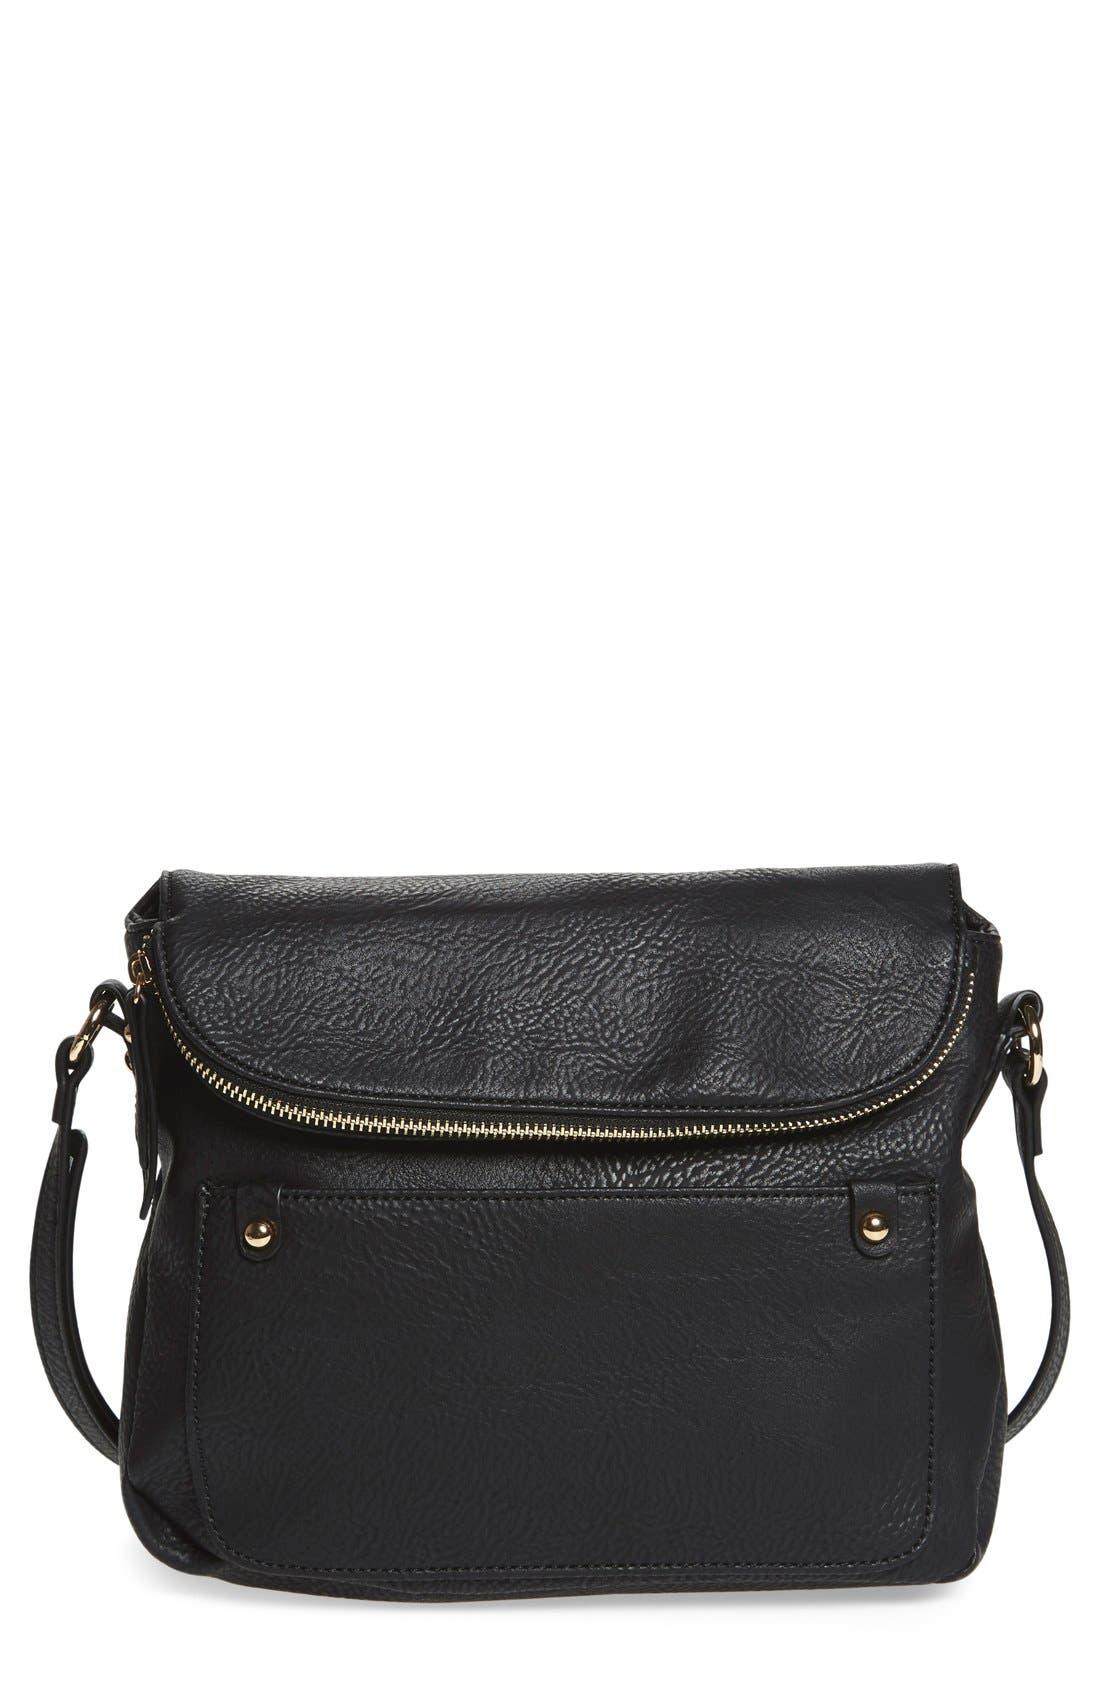 Zip Flap Faux Leather Crossbody Bag,                             Main thumbnail 1, color,                             001